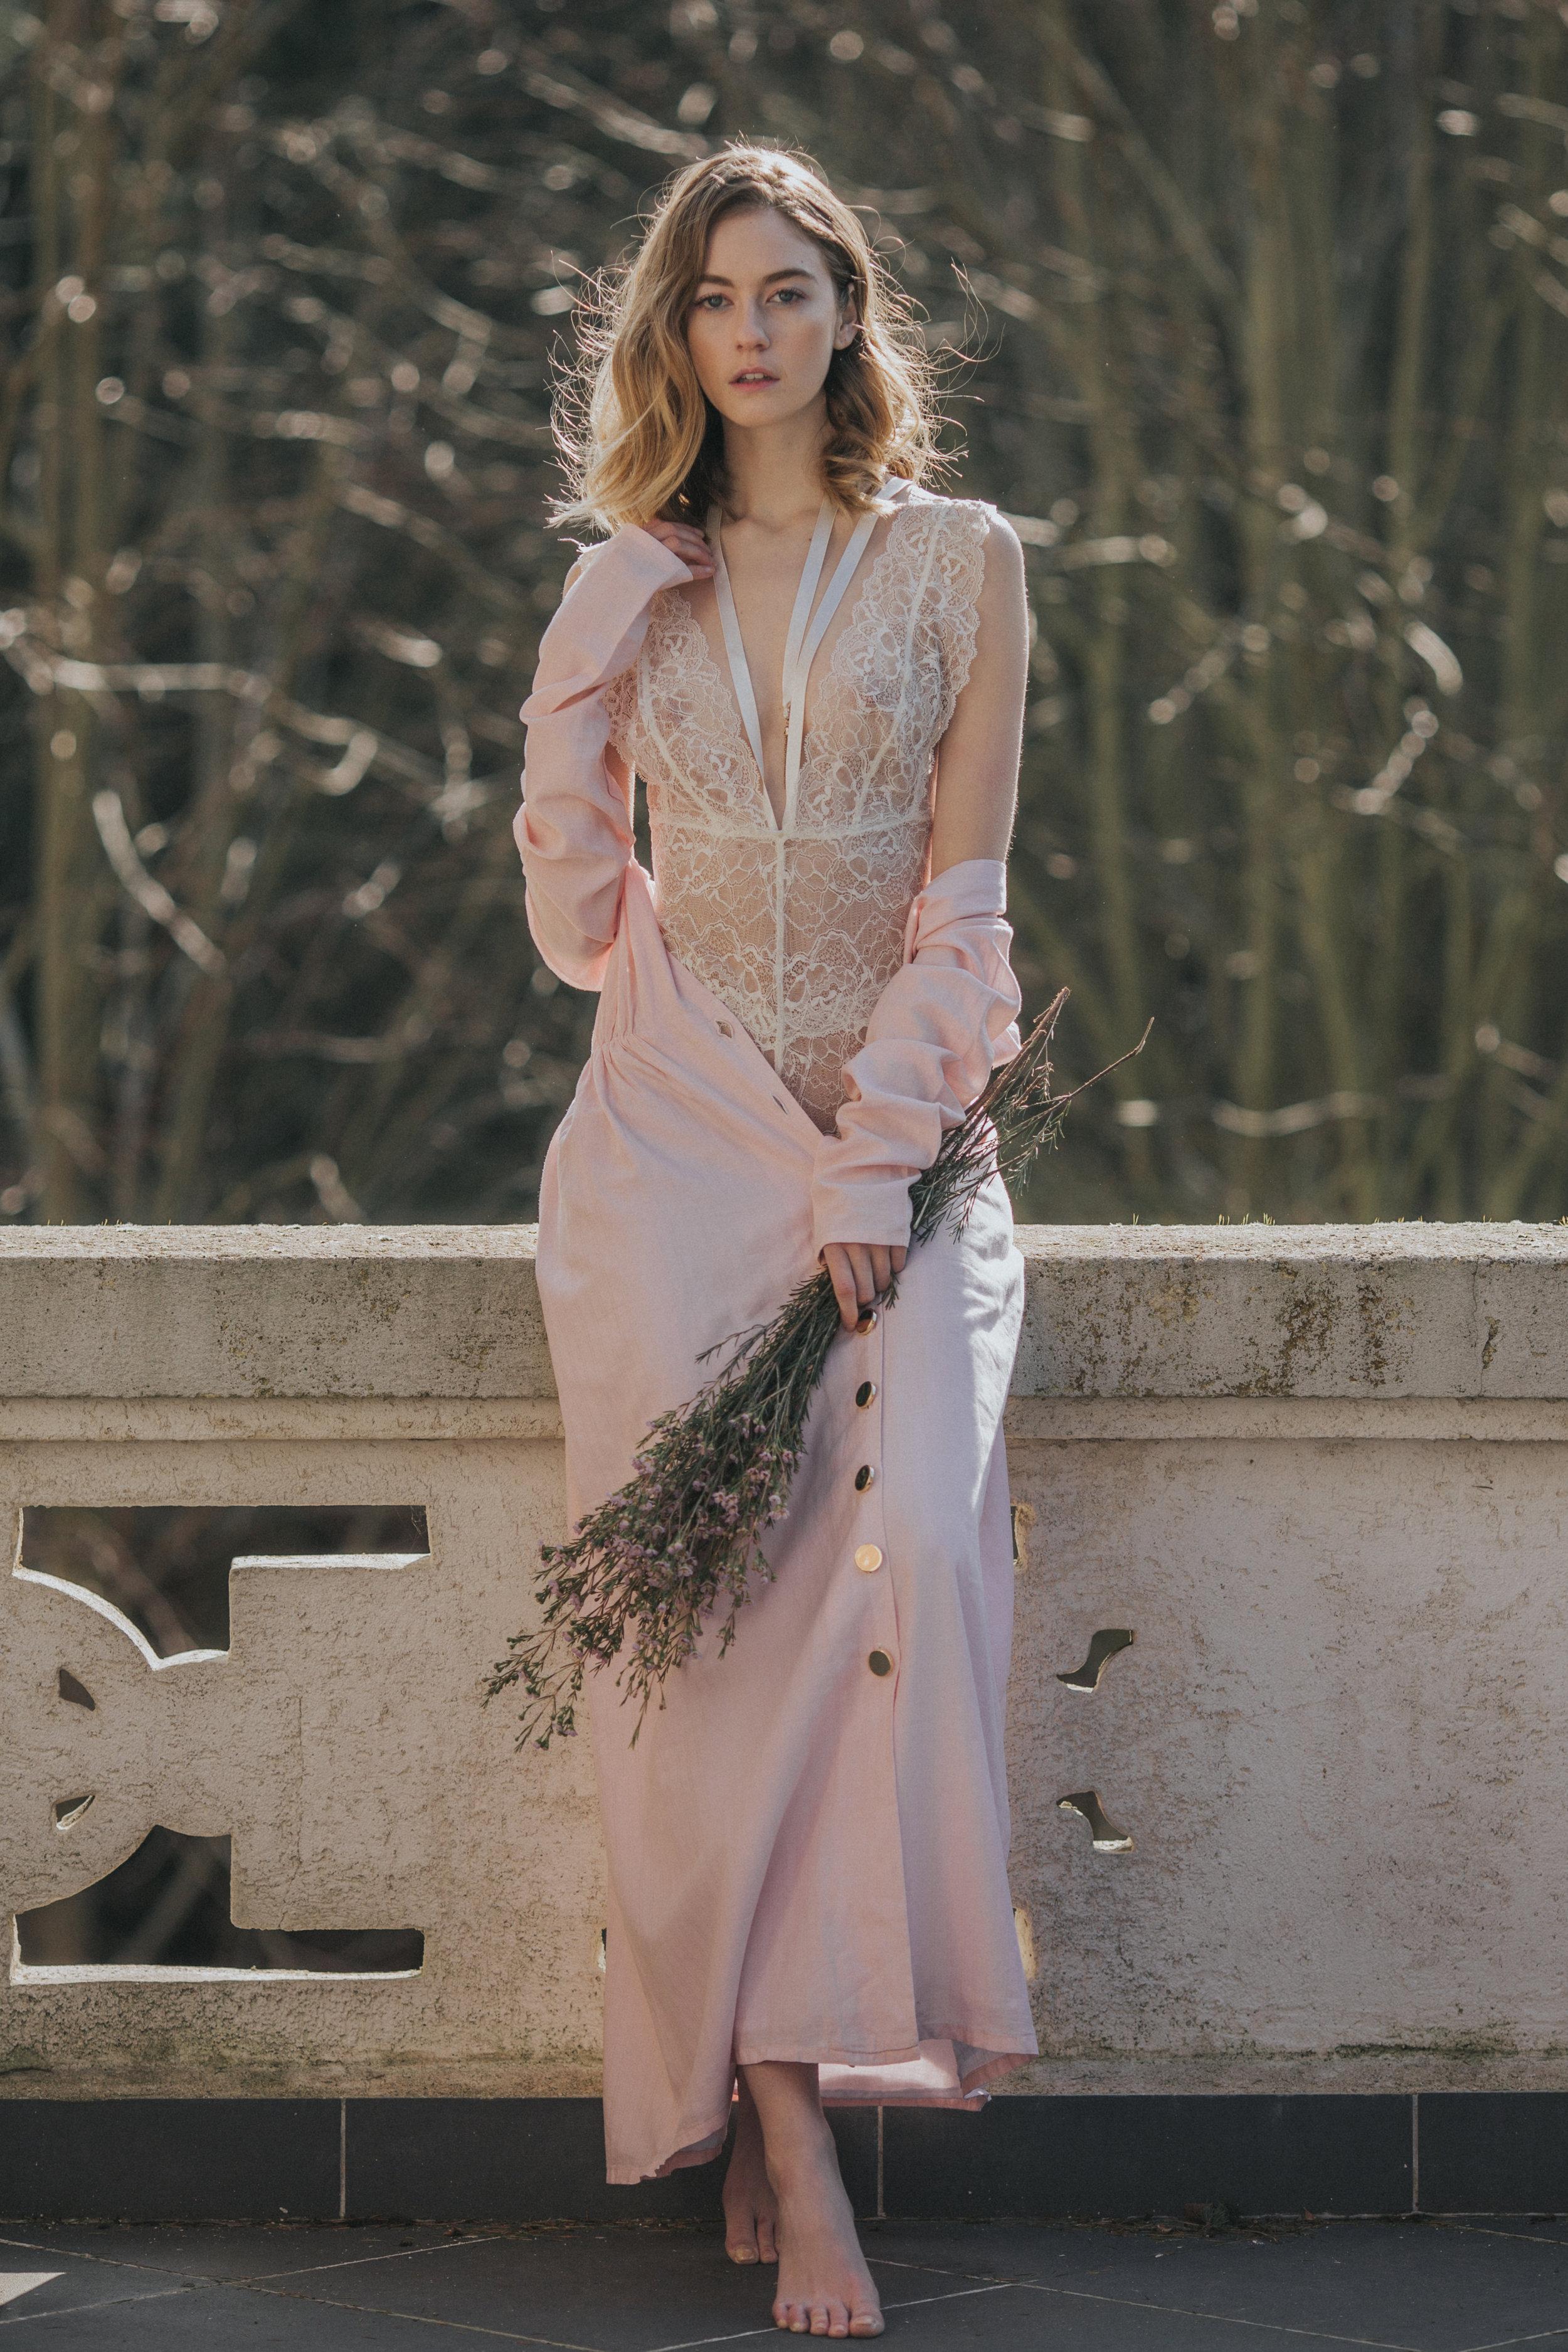 Chateau Bouffemont Fashion Editorial Photography by Charlotte Bergan